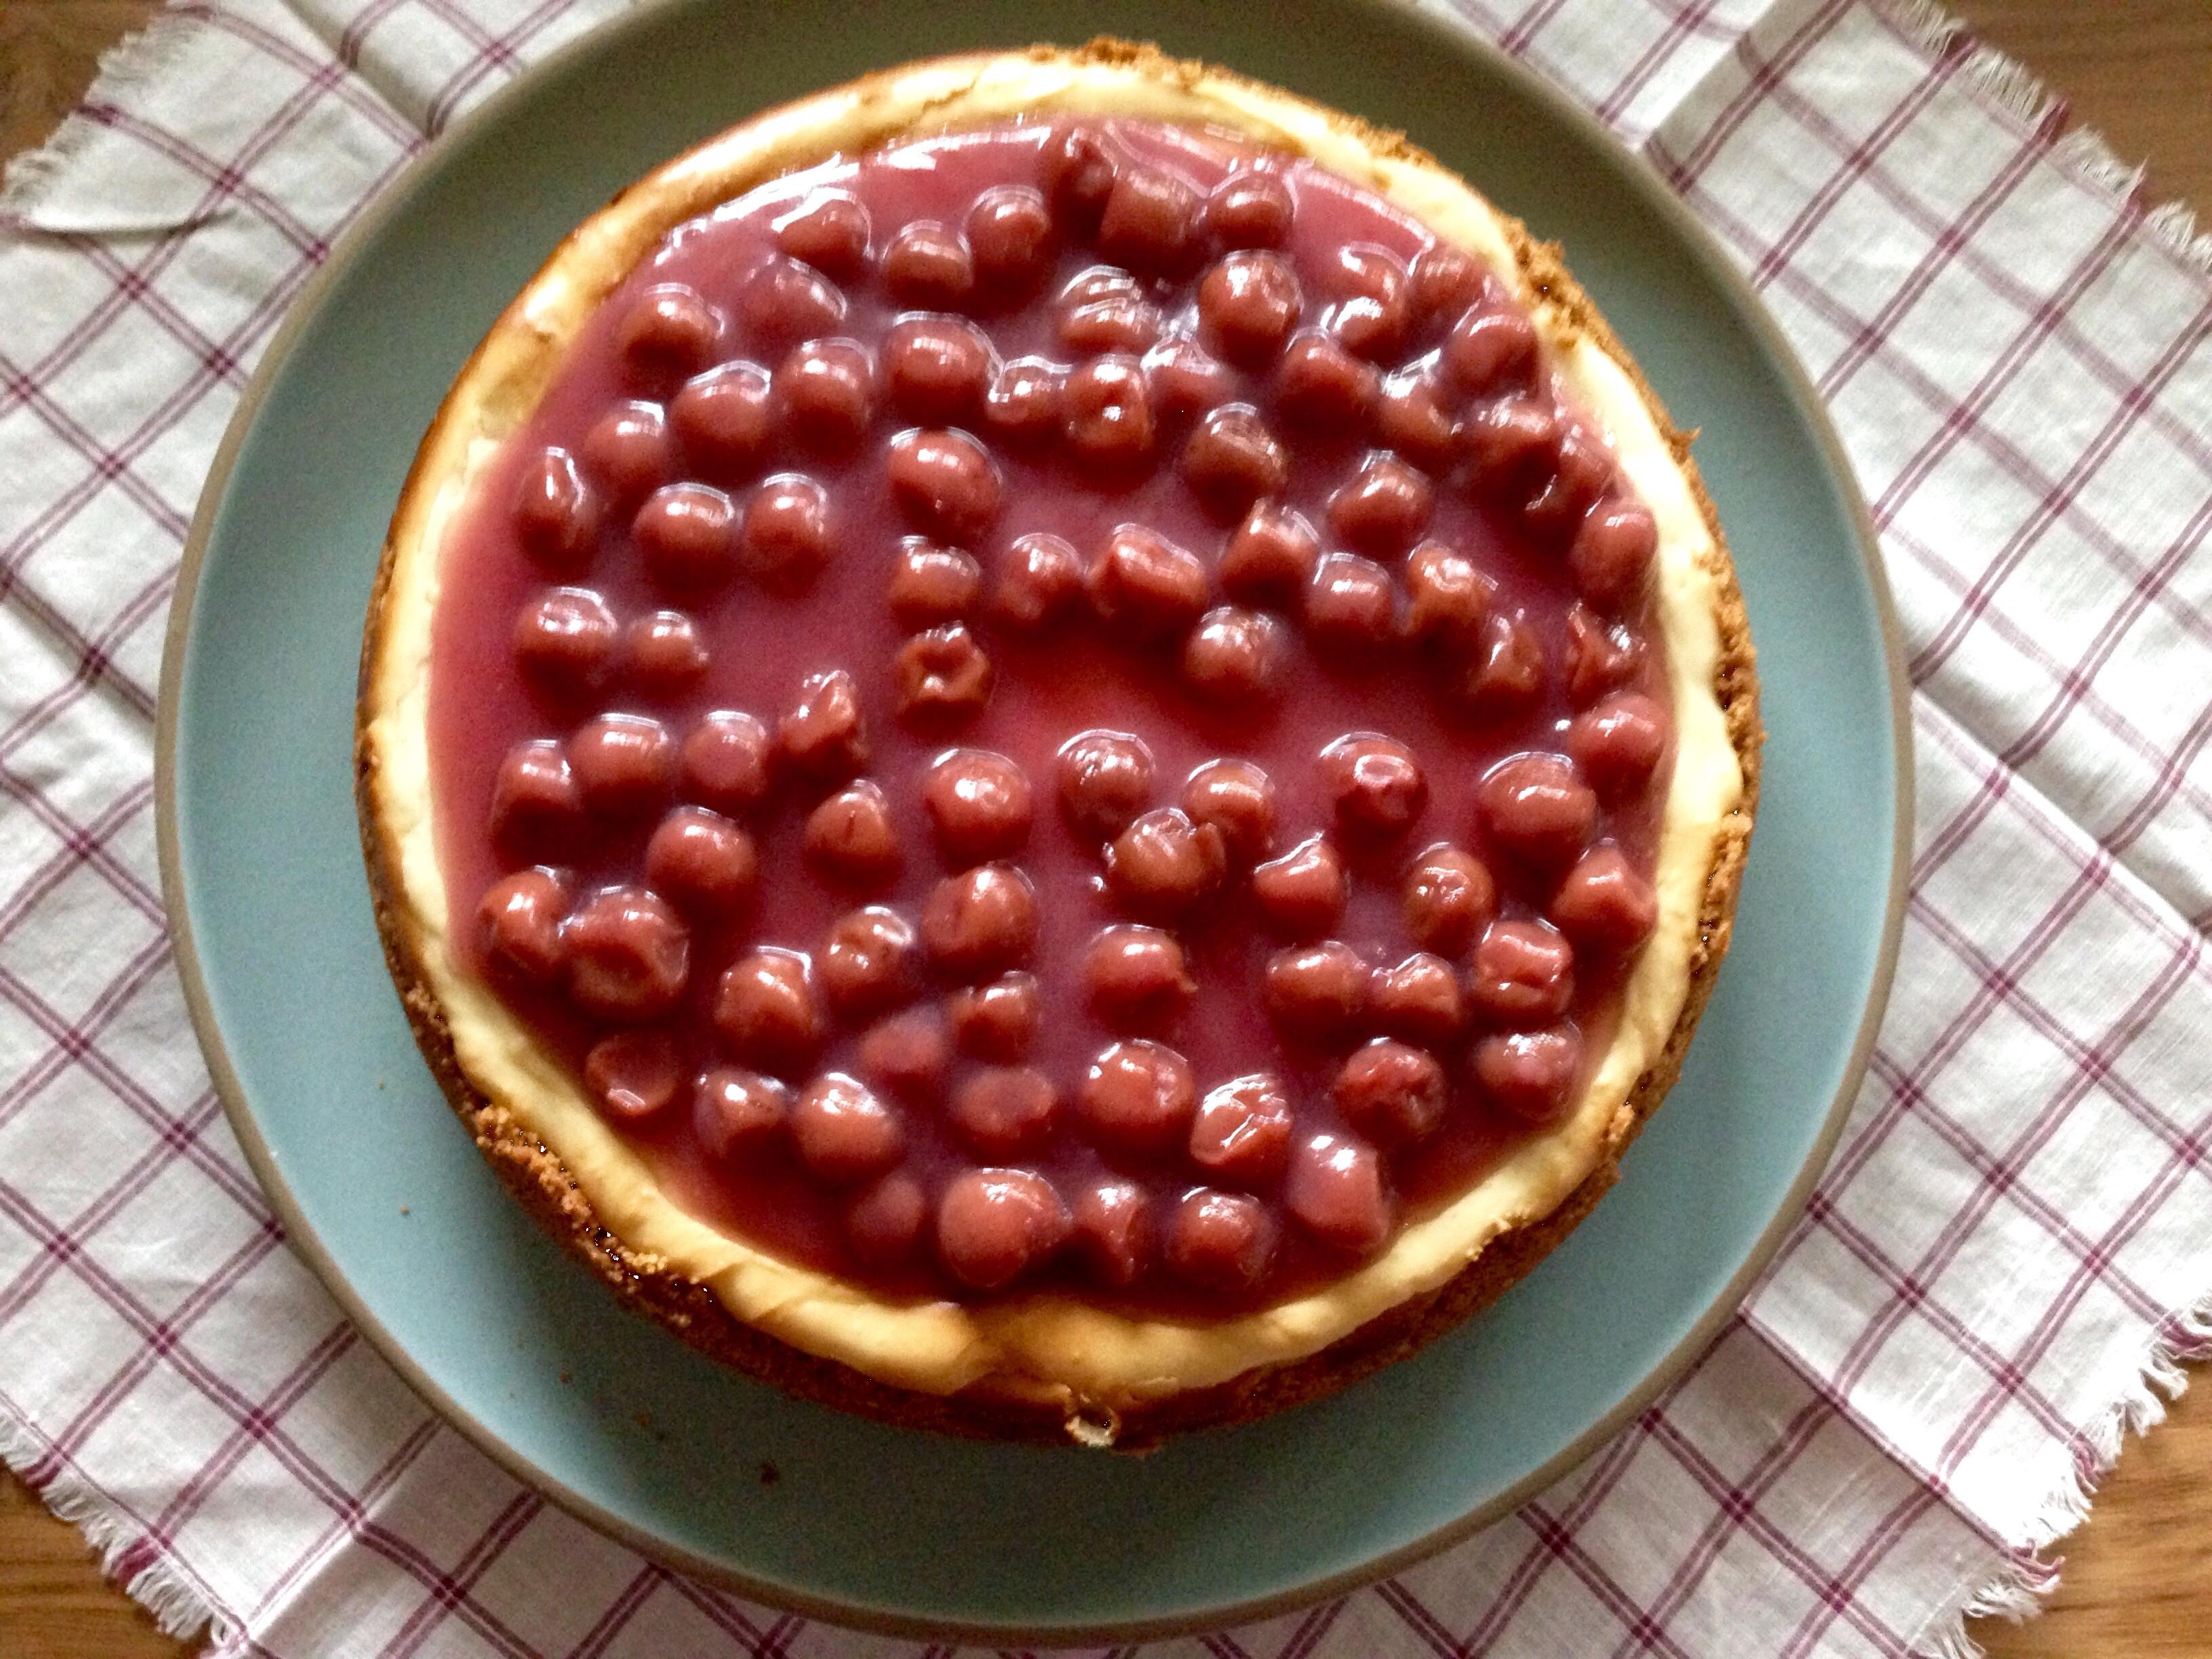 Sour Cherry Topped Homemade Vanilla Cheesecake